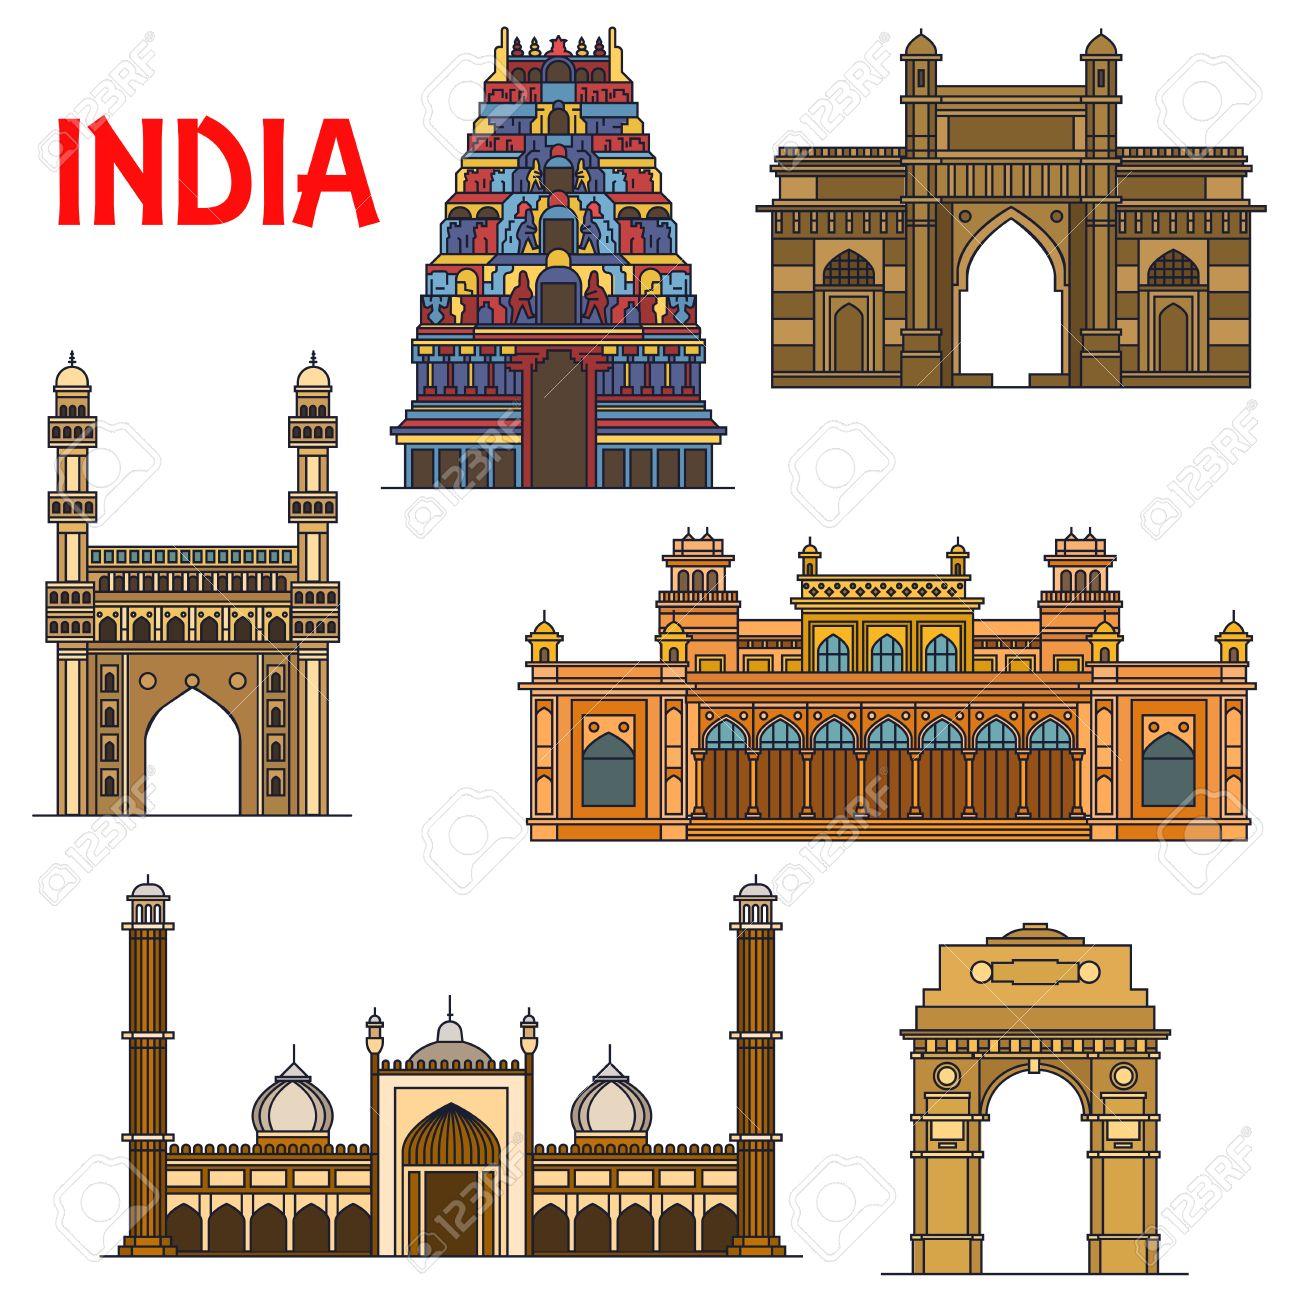 Travel landmarks of indian architecture icon with thin line India Gate, hindu Meenakshi Amman Temple, Gateway of India, islamic mosque Jama Masjid, mosque Charminar, royal palace Chowmahalla - 62639032